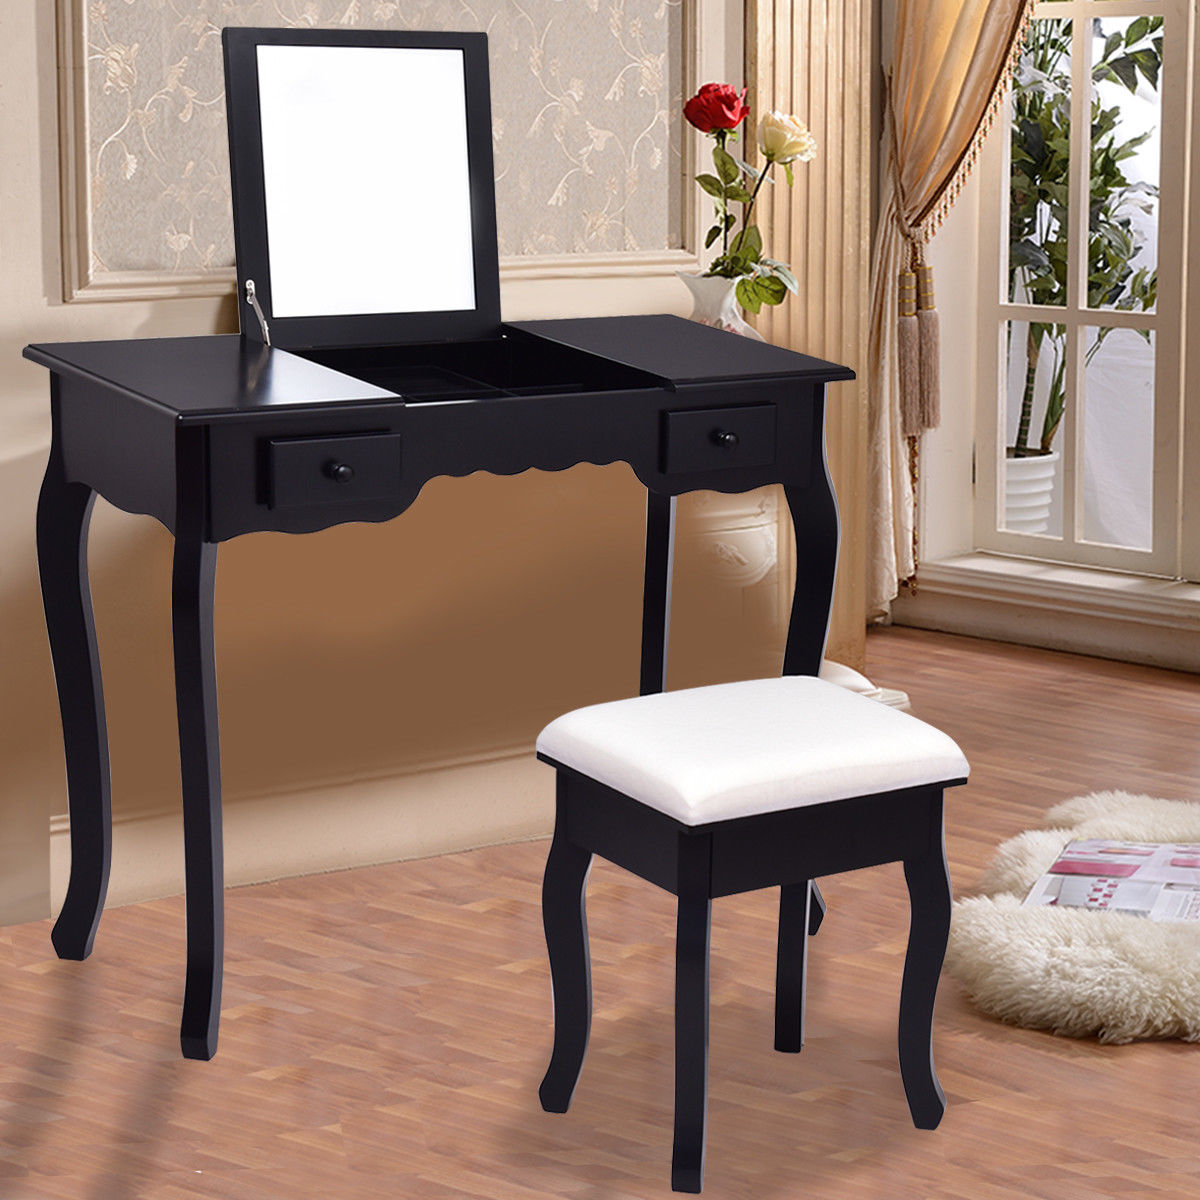 Giantex Modern Vanity Dressing Table Set Mirrored Bathroom